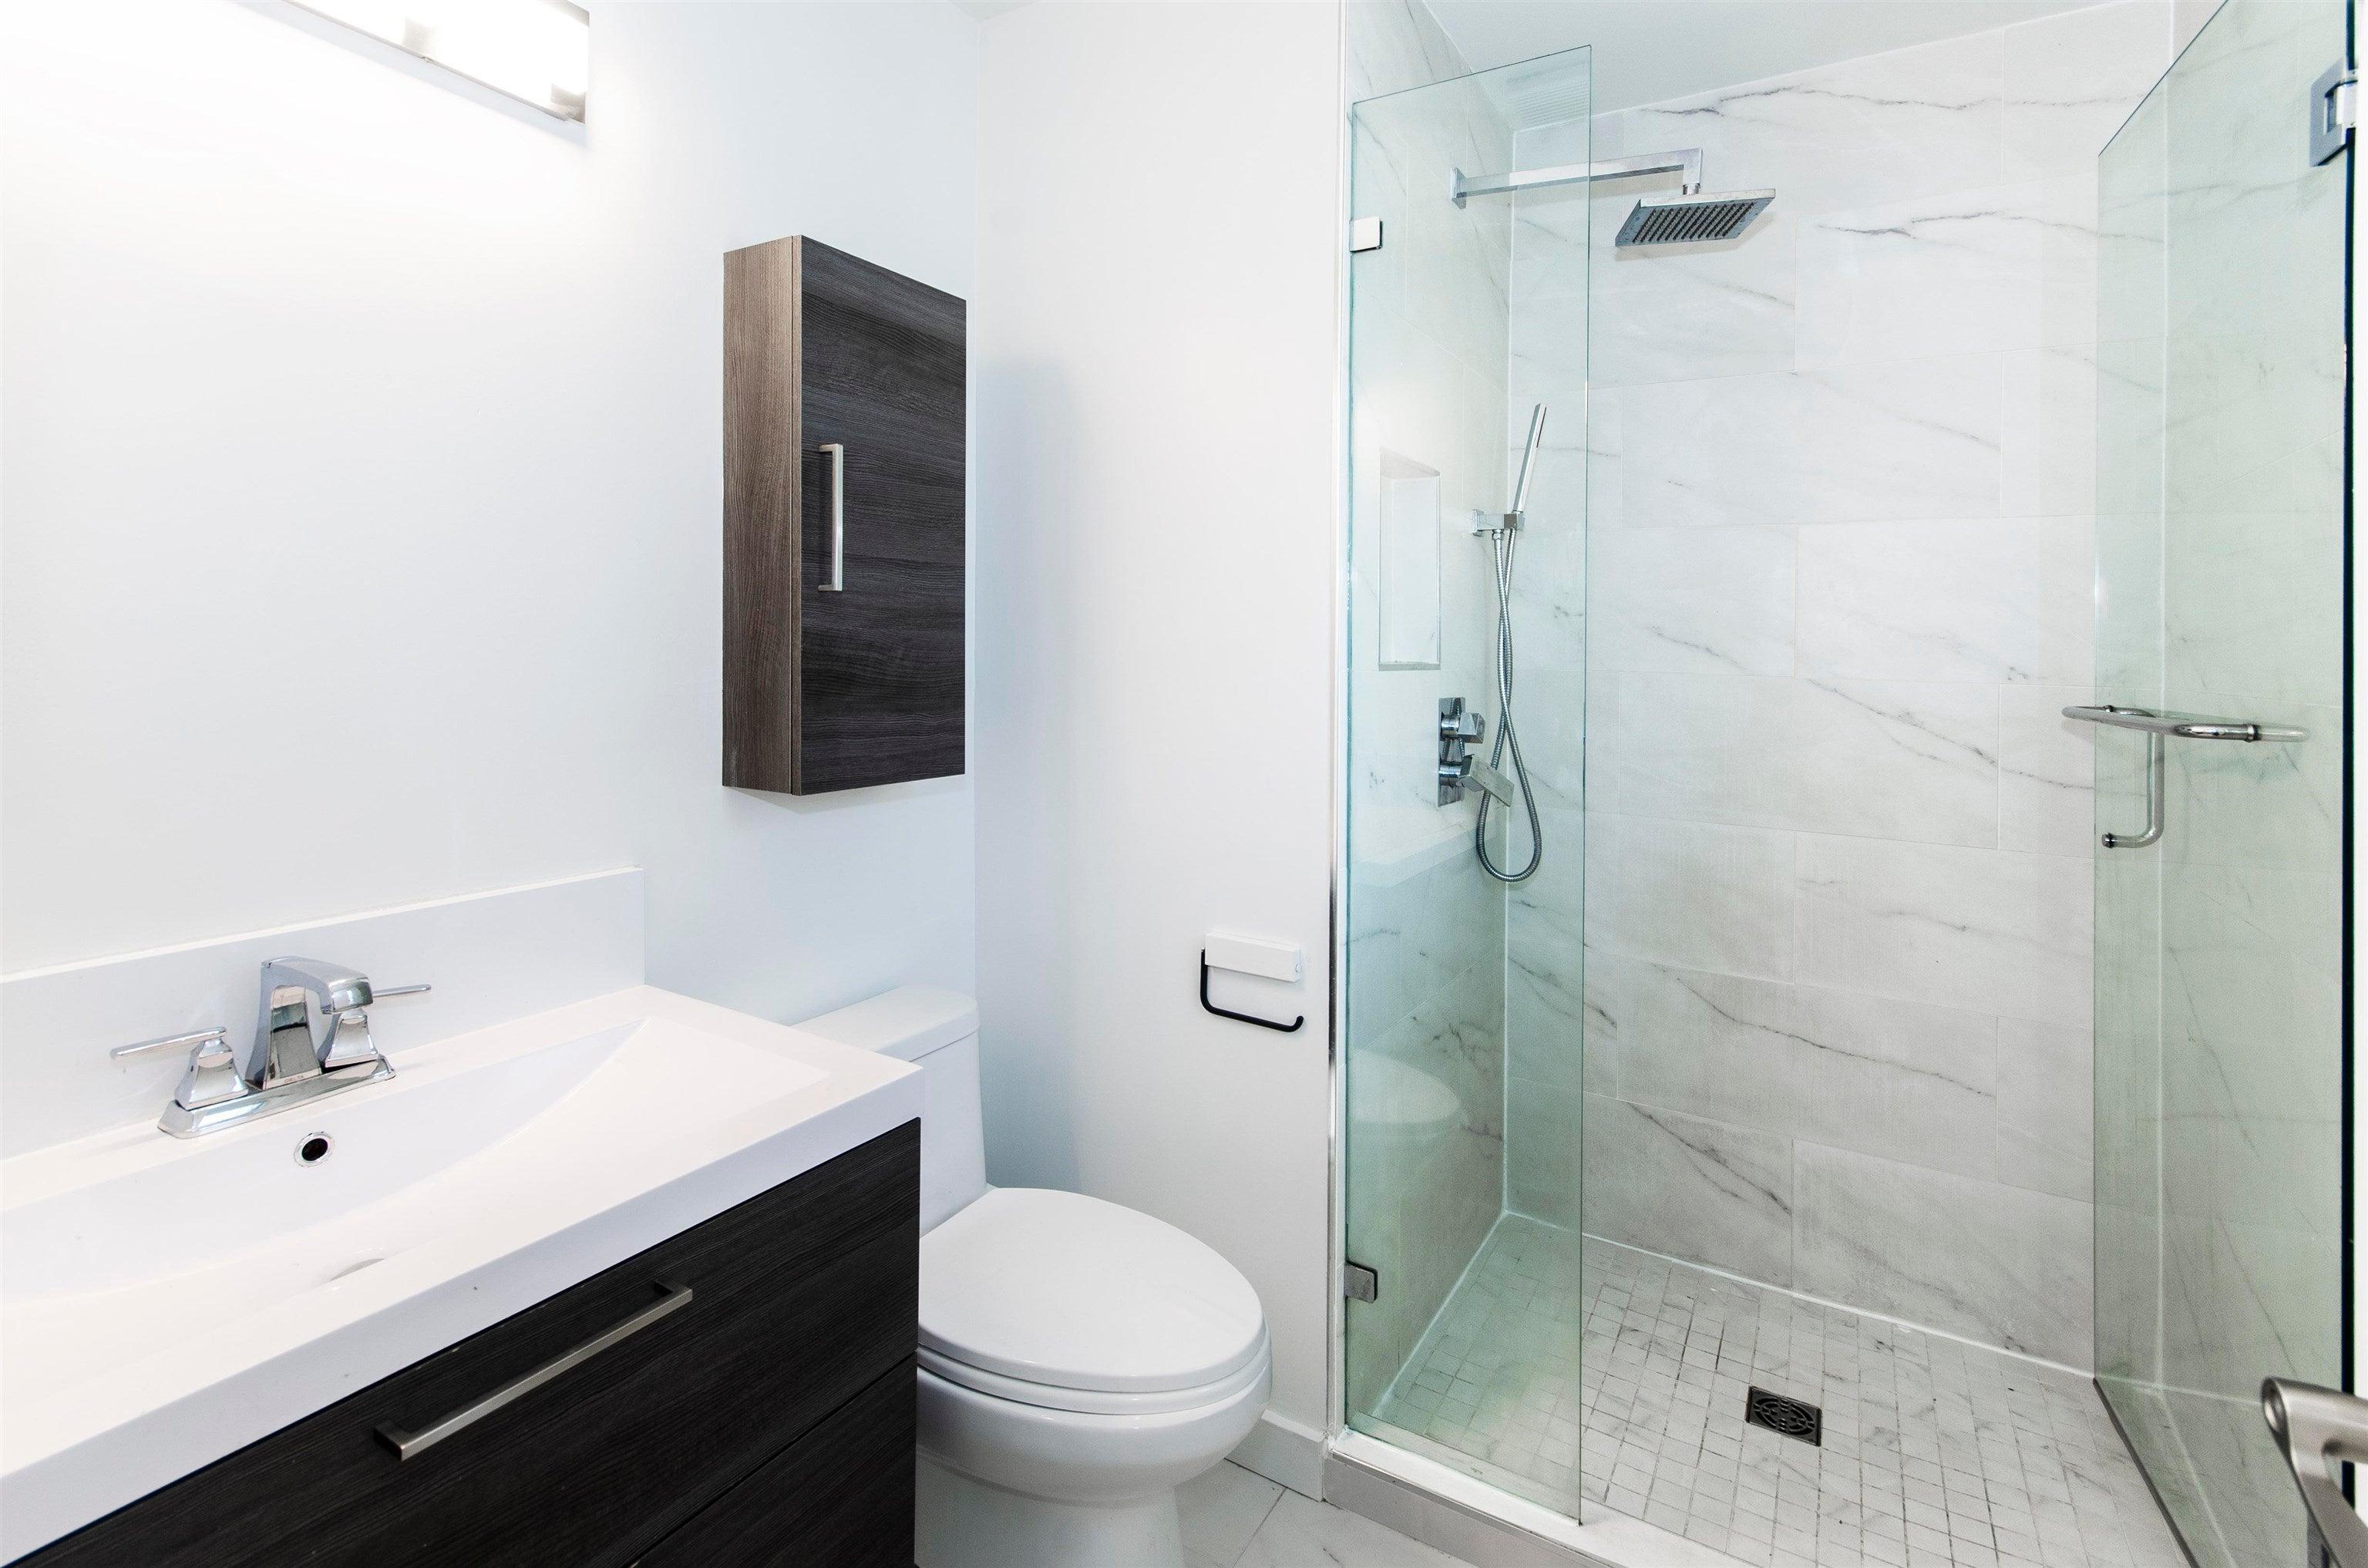 3785 REGENT AVENUE - Upper Lonsdale House/Single Family for sale, 4 Bedrooms (R2617648) - #20